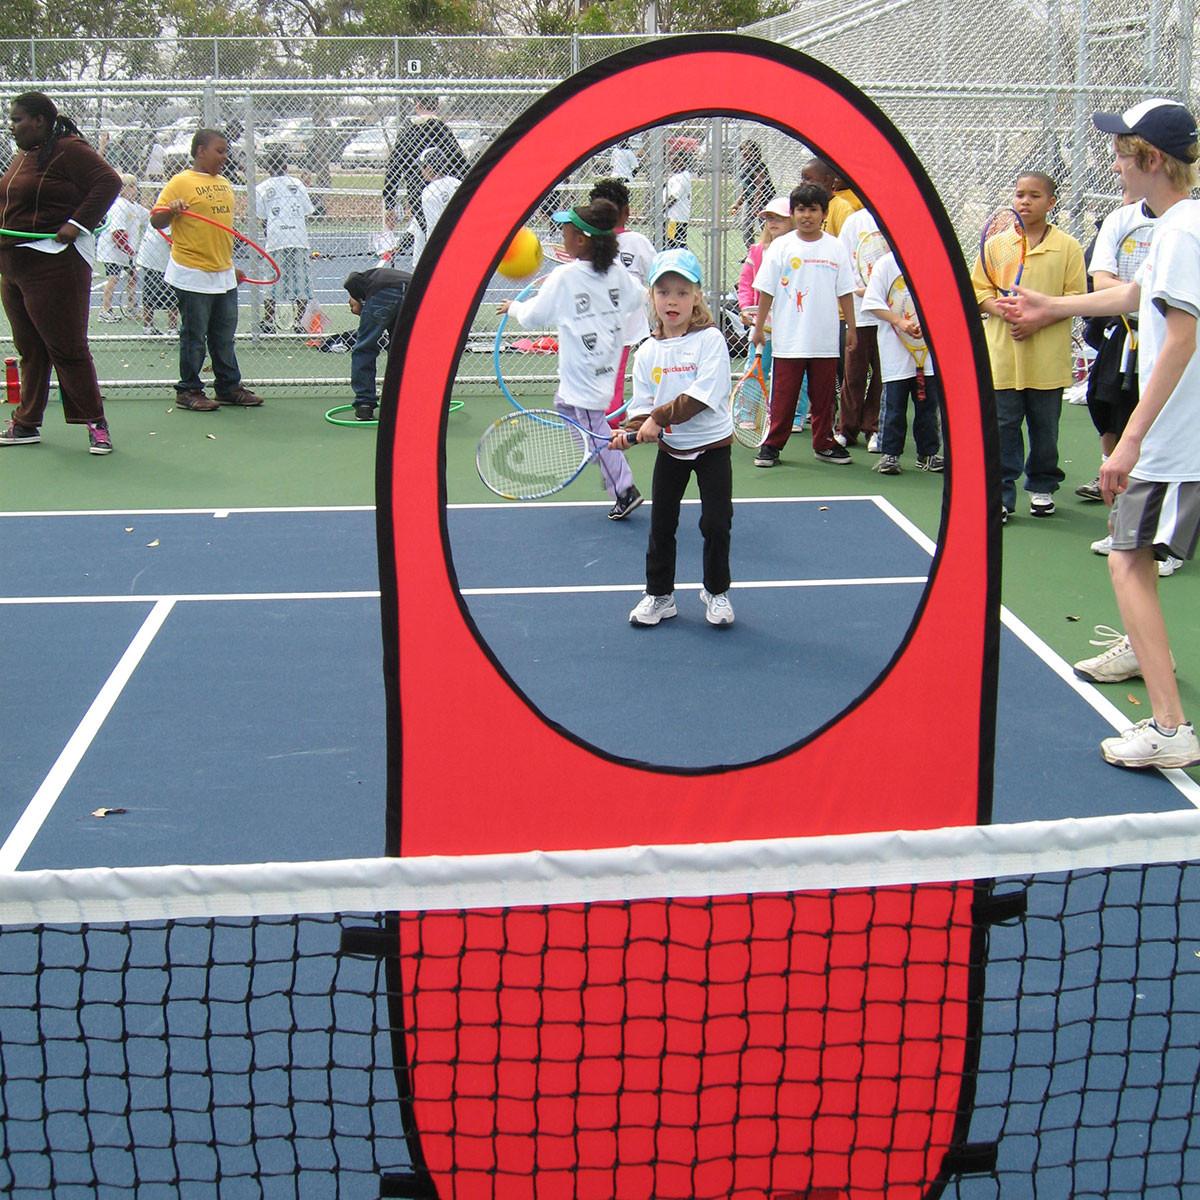 fabd46ddbd Tennis Target Training - Tennis Pop-Up Targets